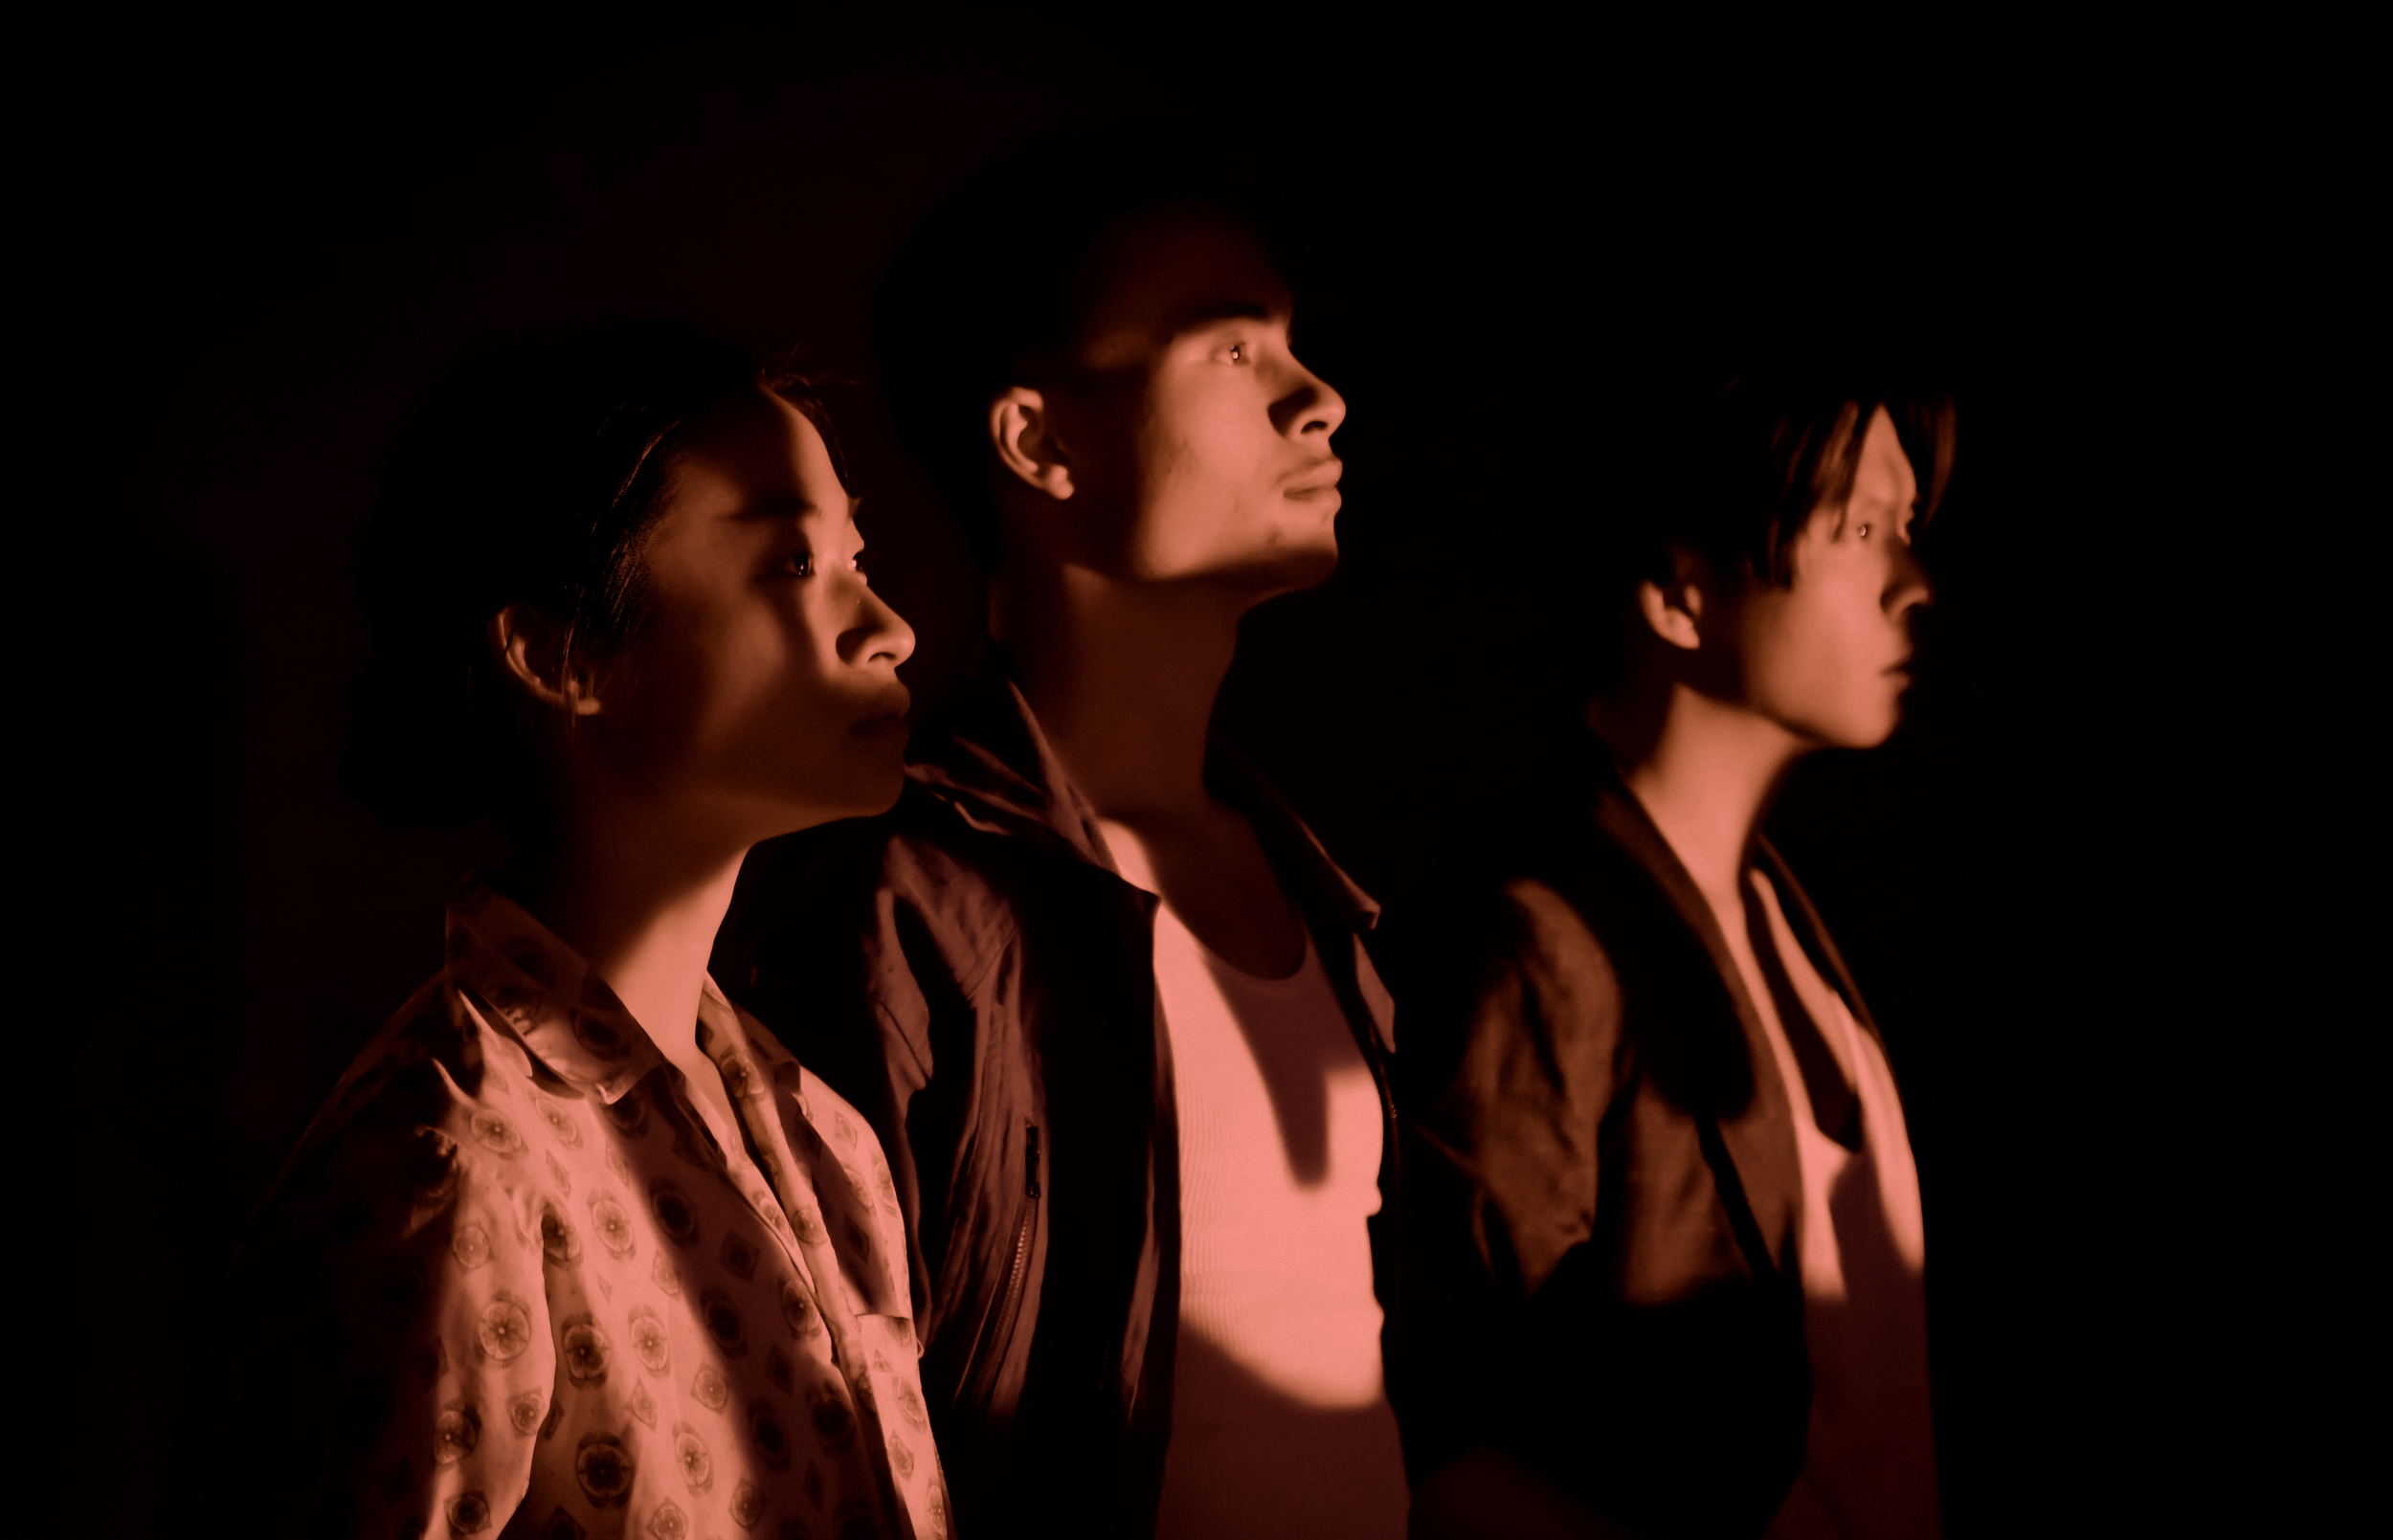 HKX+-+NINEEIGHT+Promotional+Photo+2.jpg